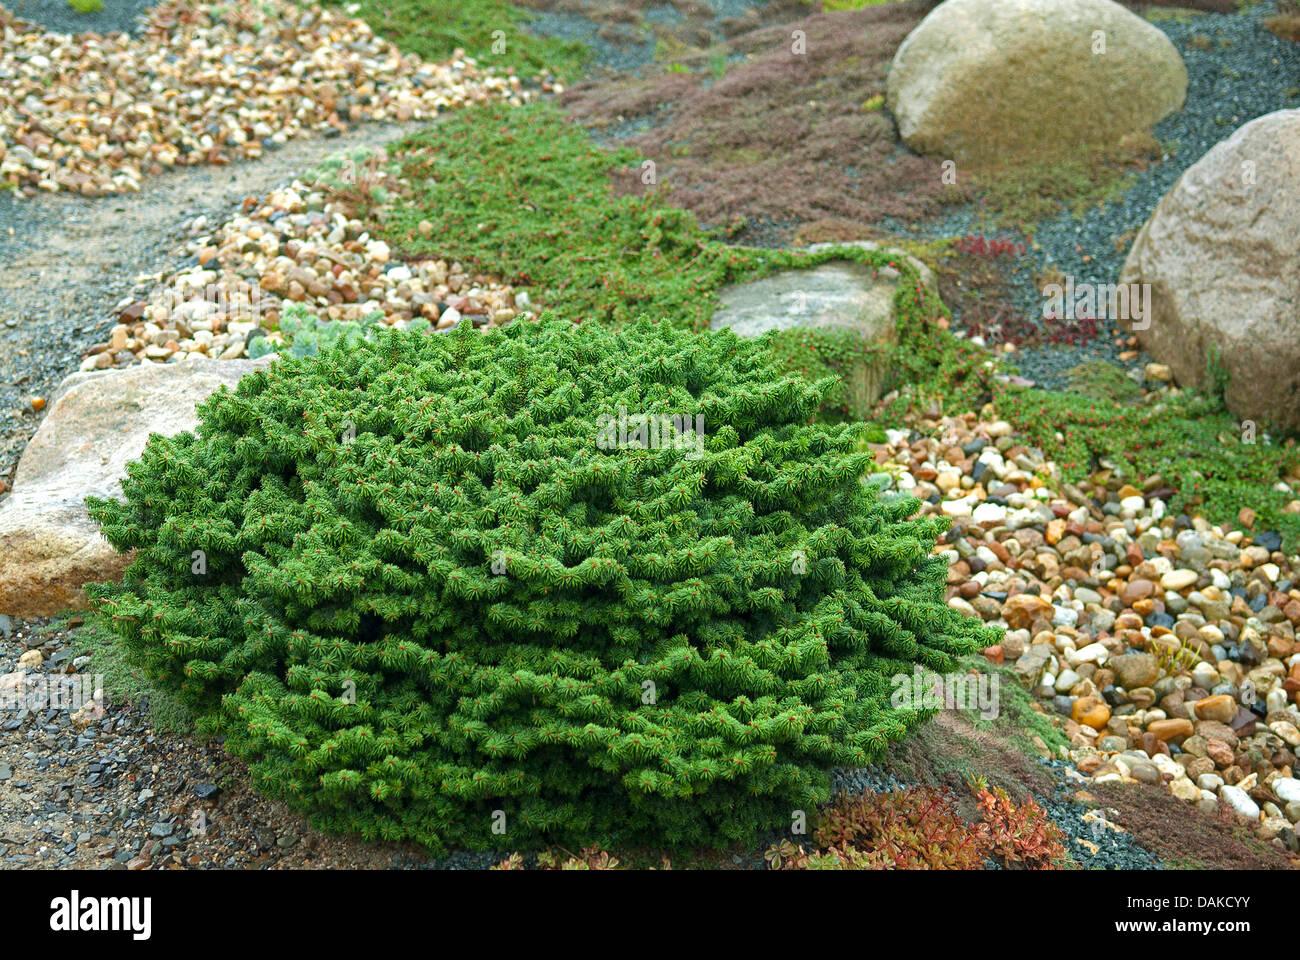 balsam fir (Abies balsamea 'Nana', Abies balsamea Nana), cultivar Nana - Stock Image